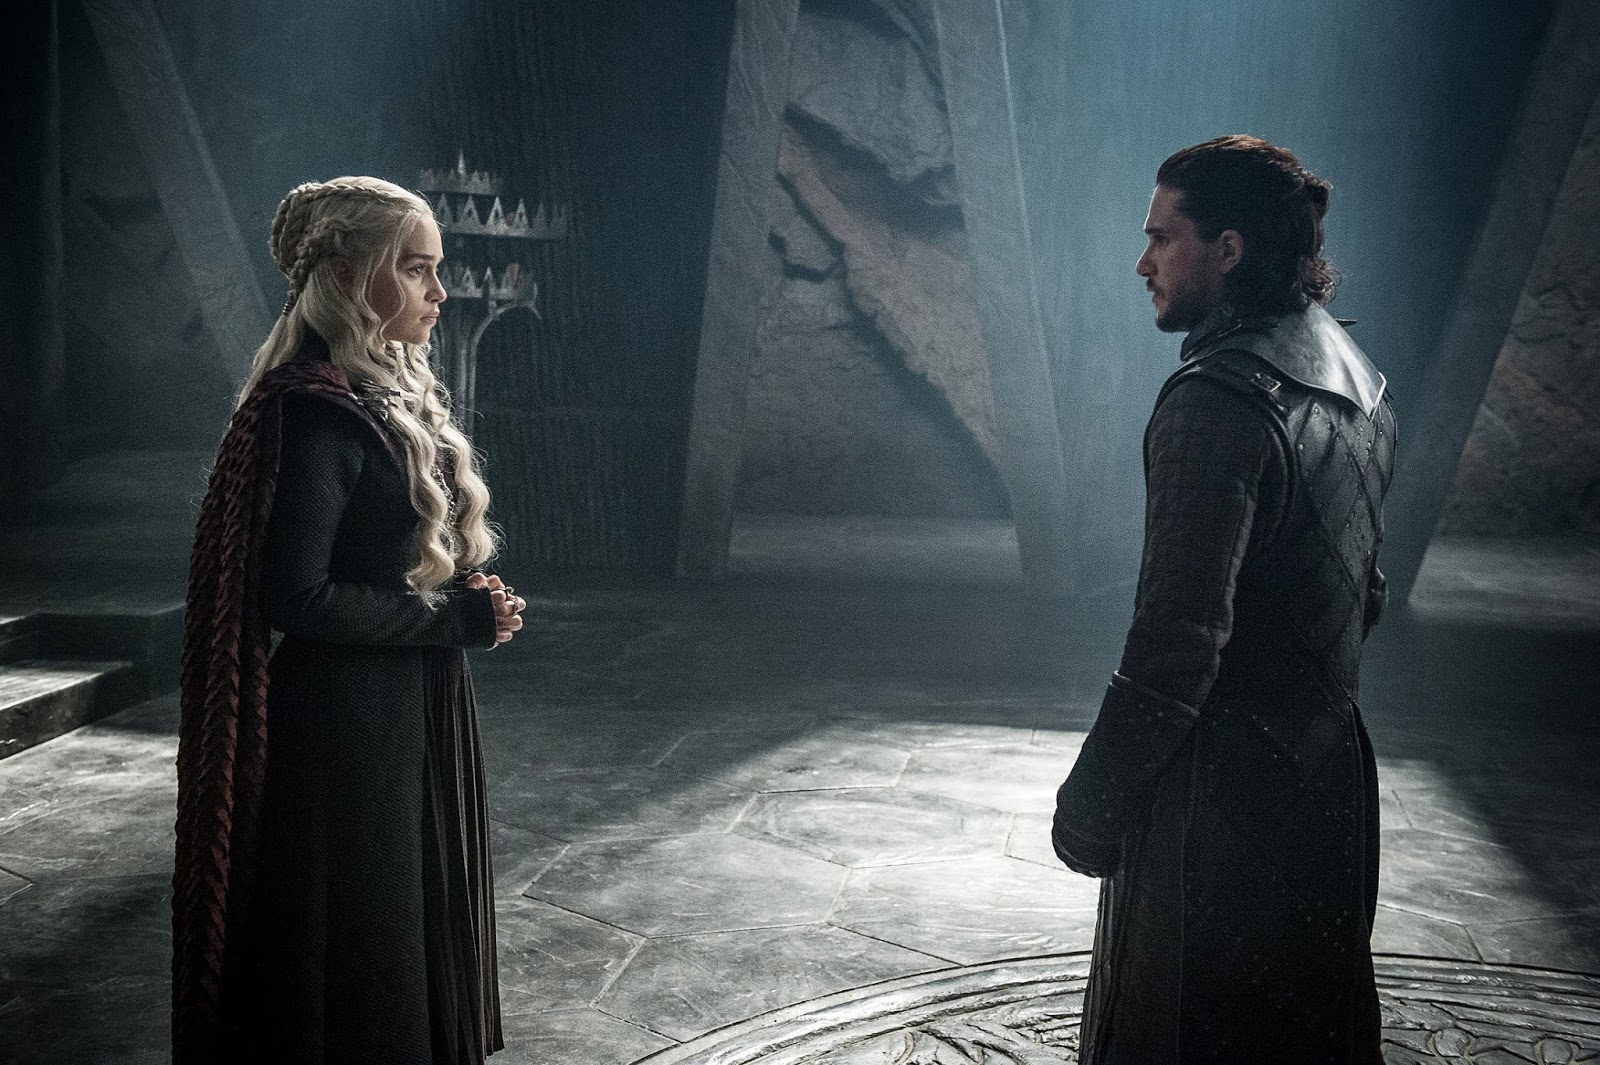 Juego de Tronos 7 - Daenerys Targaryen y Jon Snow